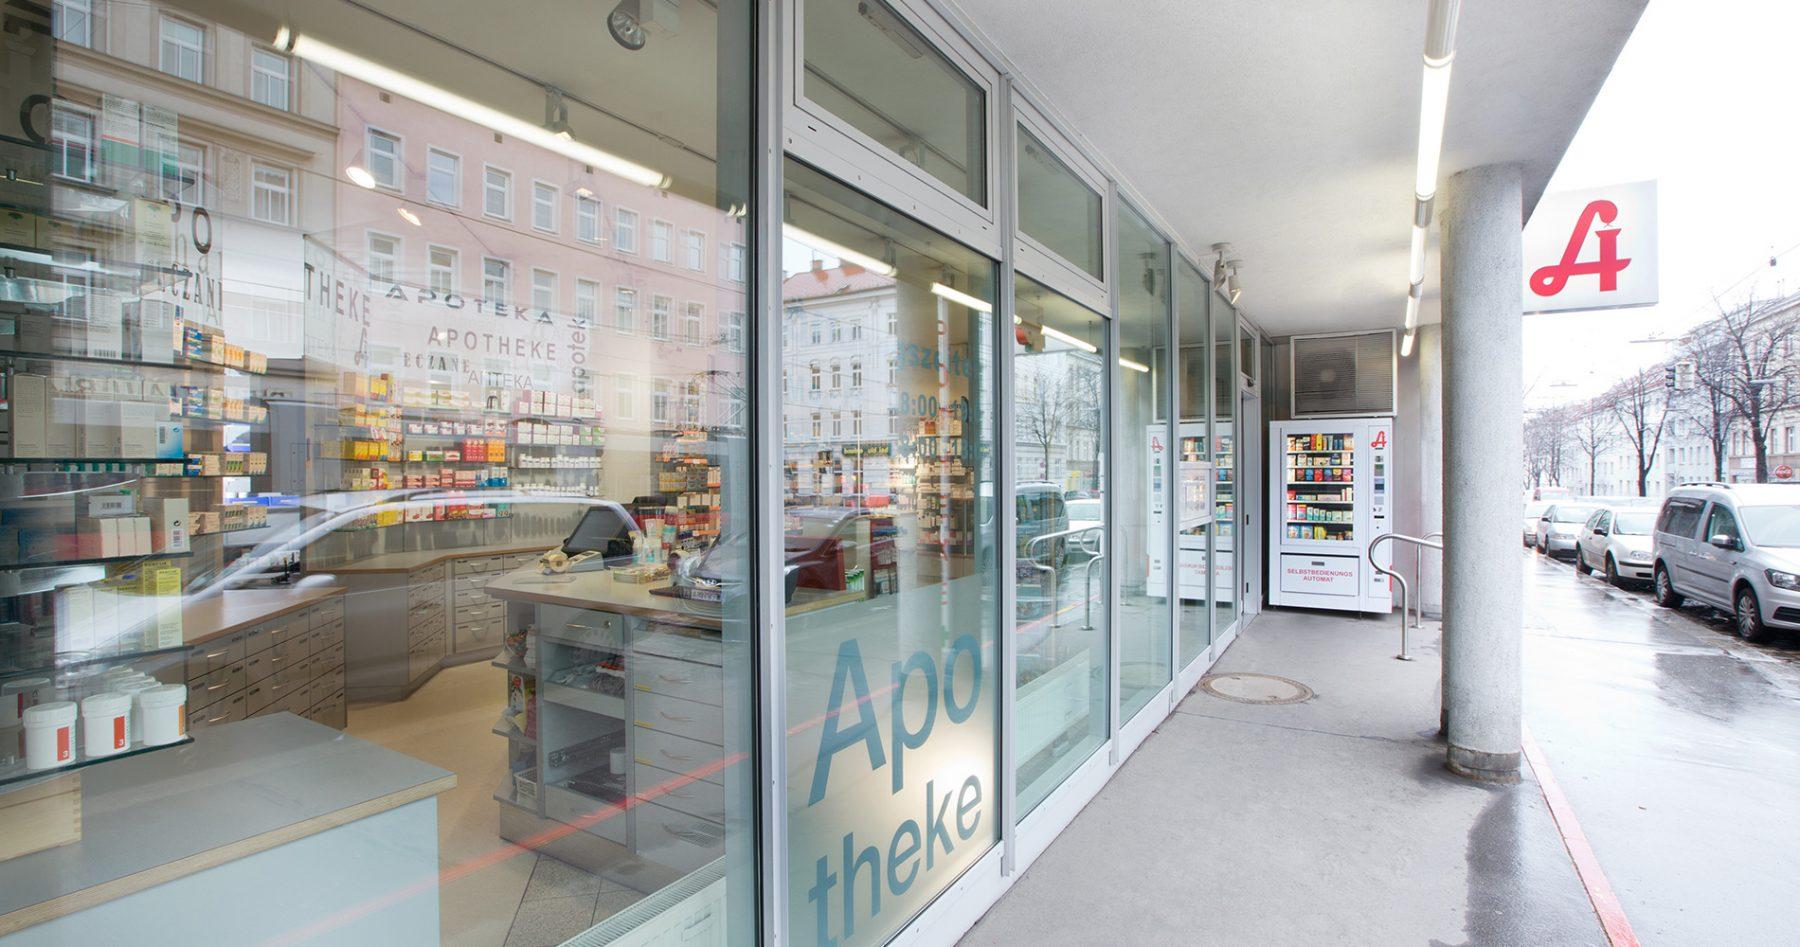 Alte Remise Apotheke Wien